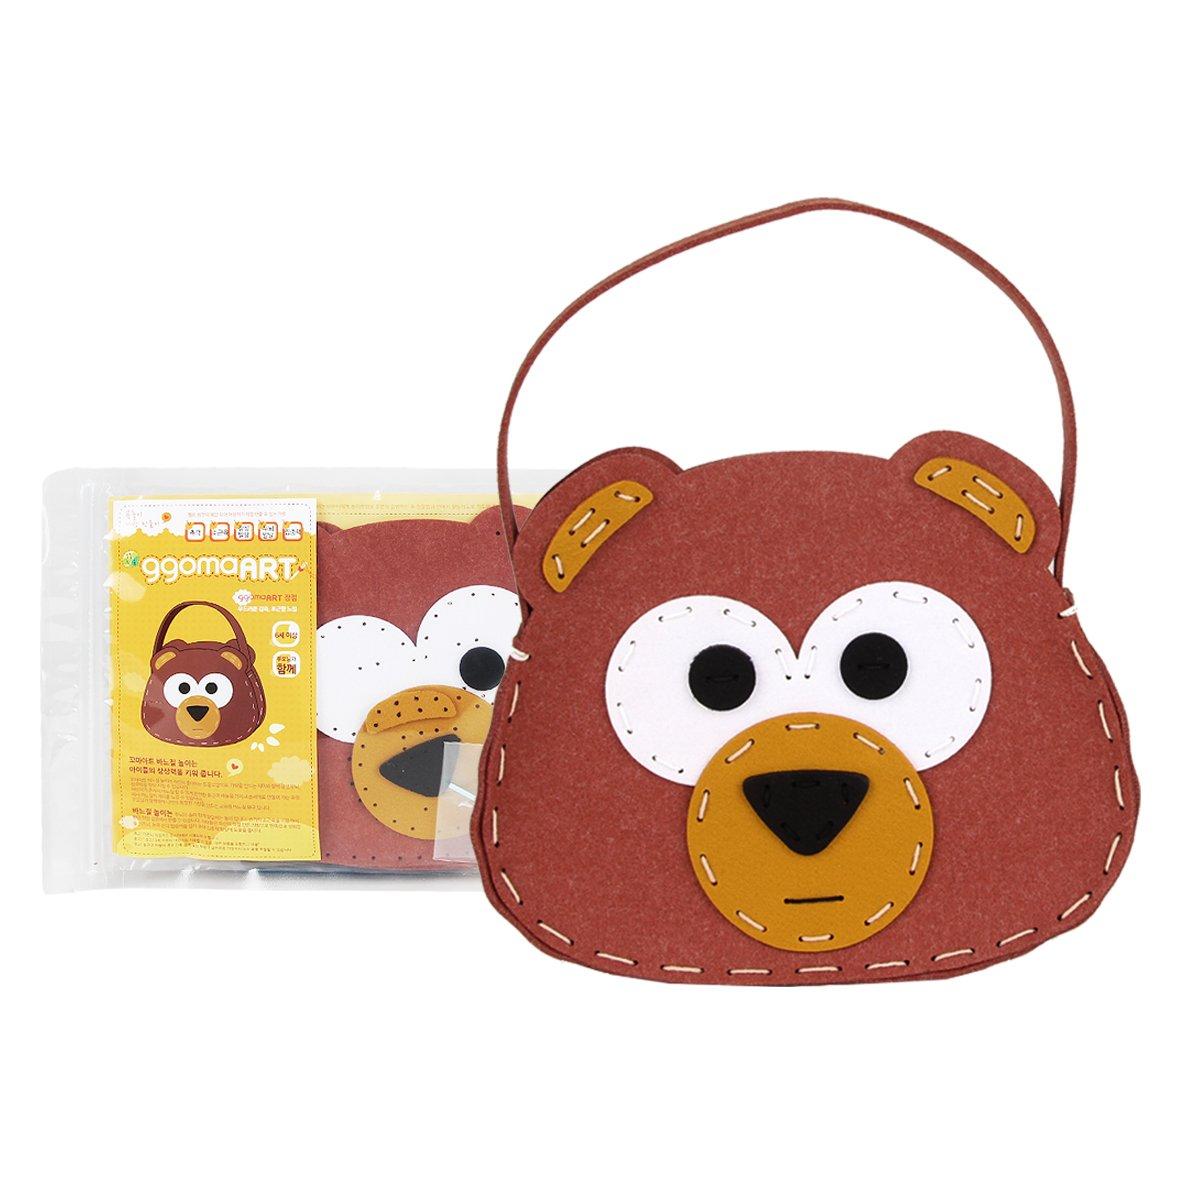 (BAG BEAR) - ggomaArt Sewing kit for Kids DIY Crafts Bear Handbag   B01N15979E